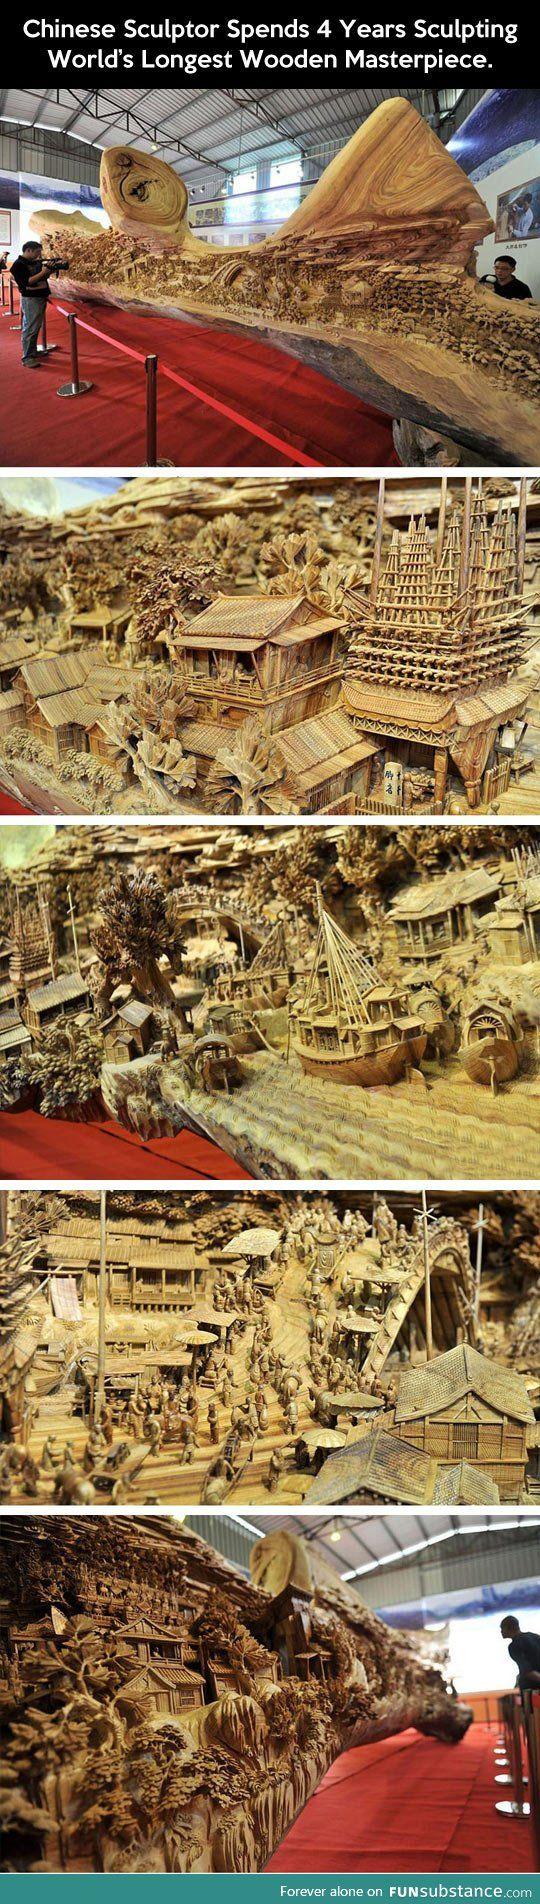 World's longest wooden masterpiece.